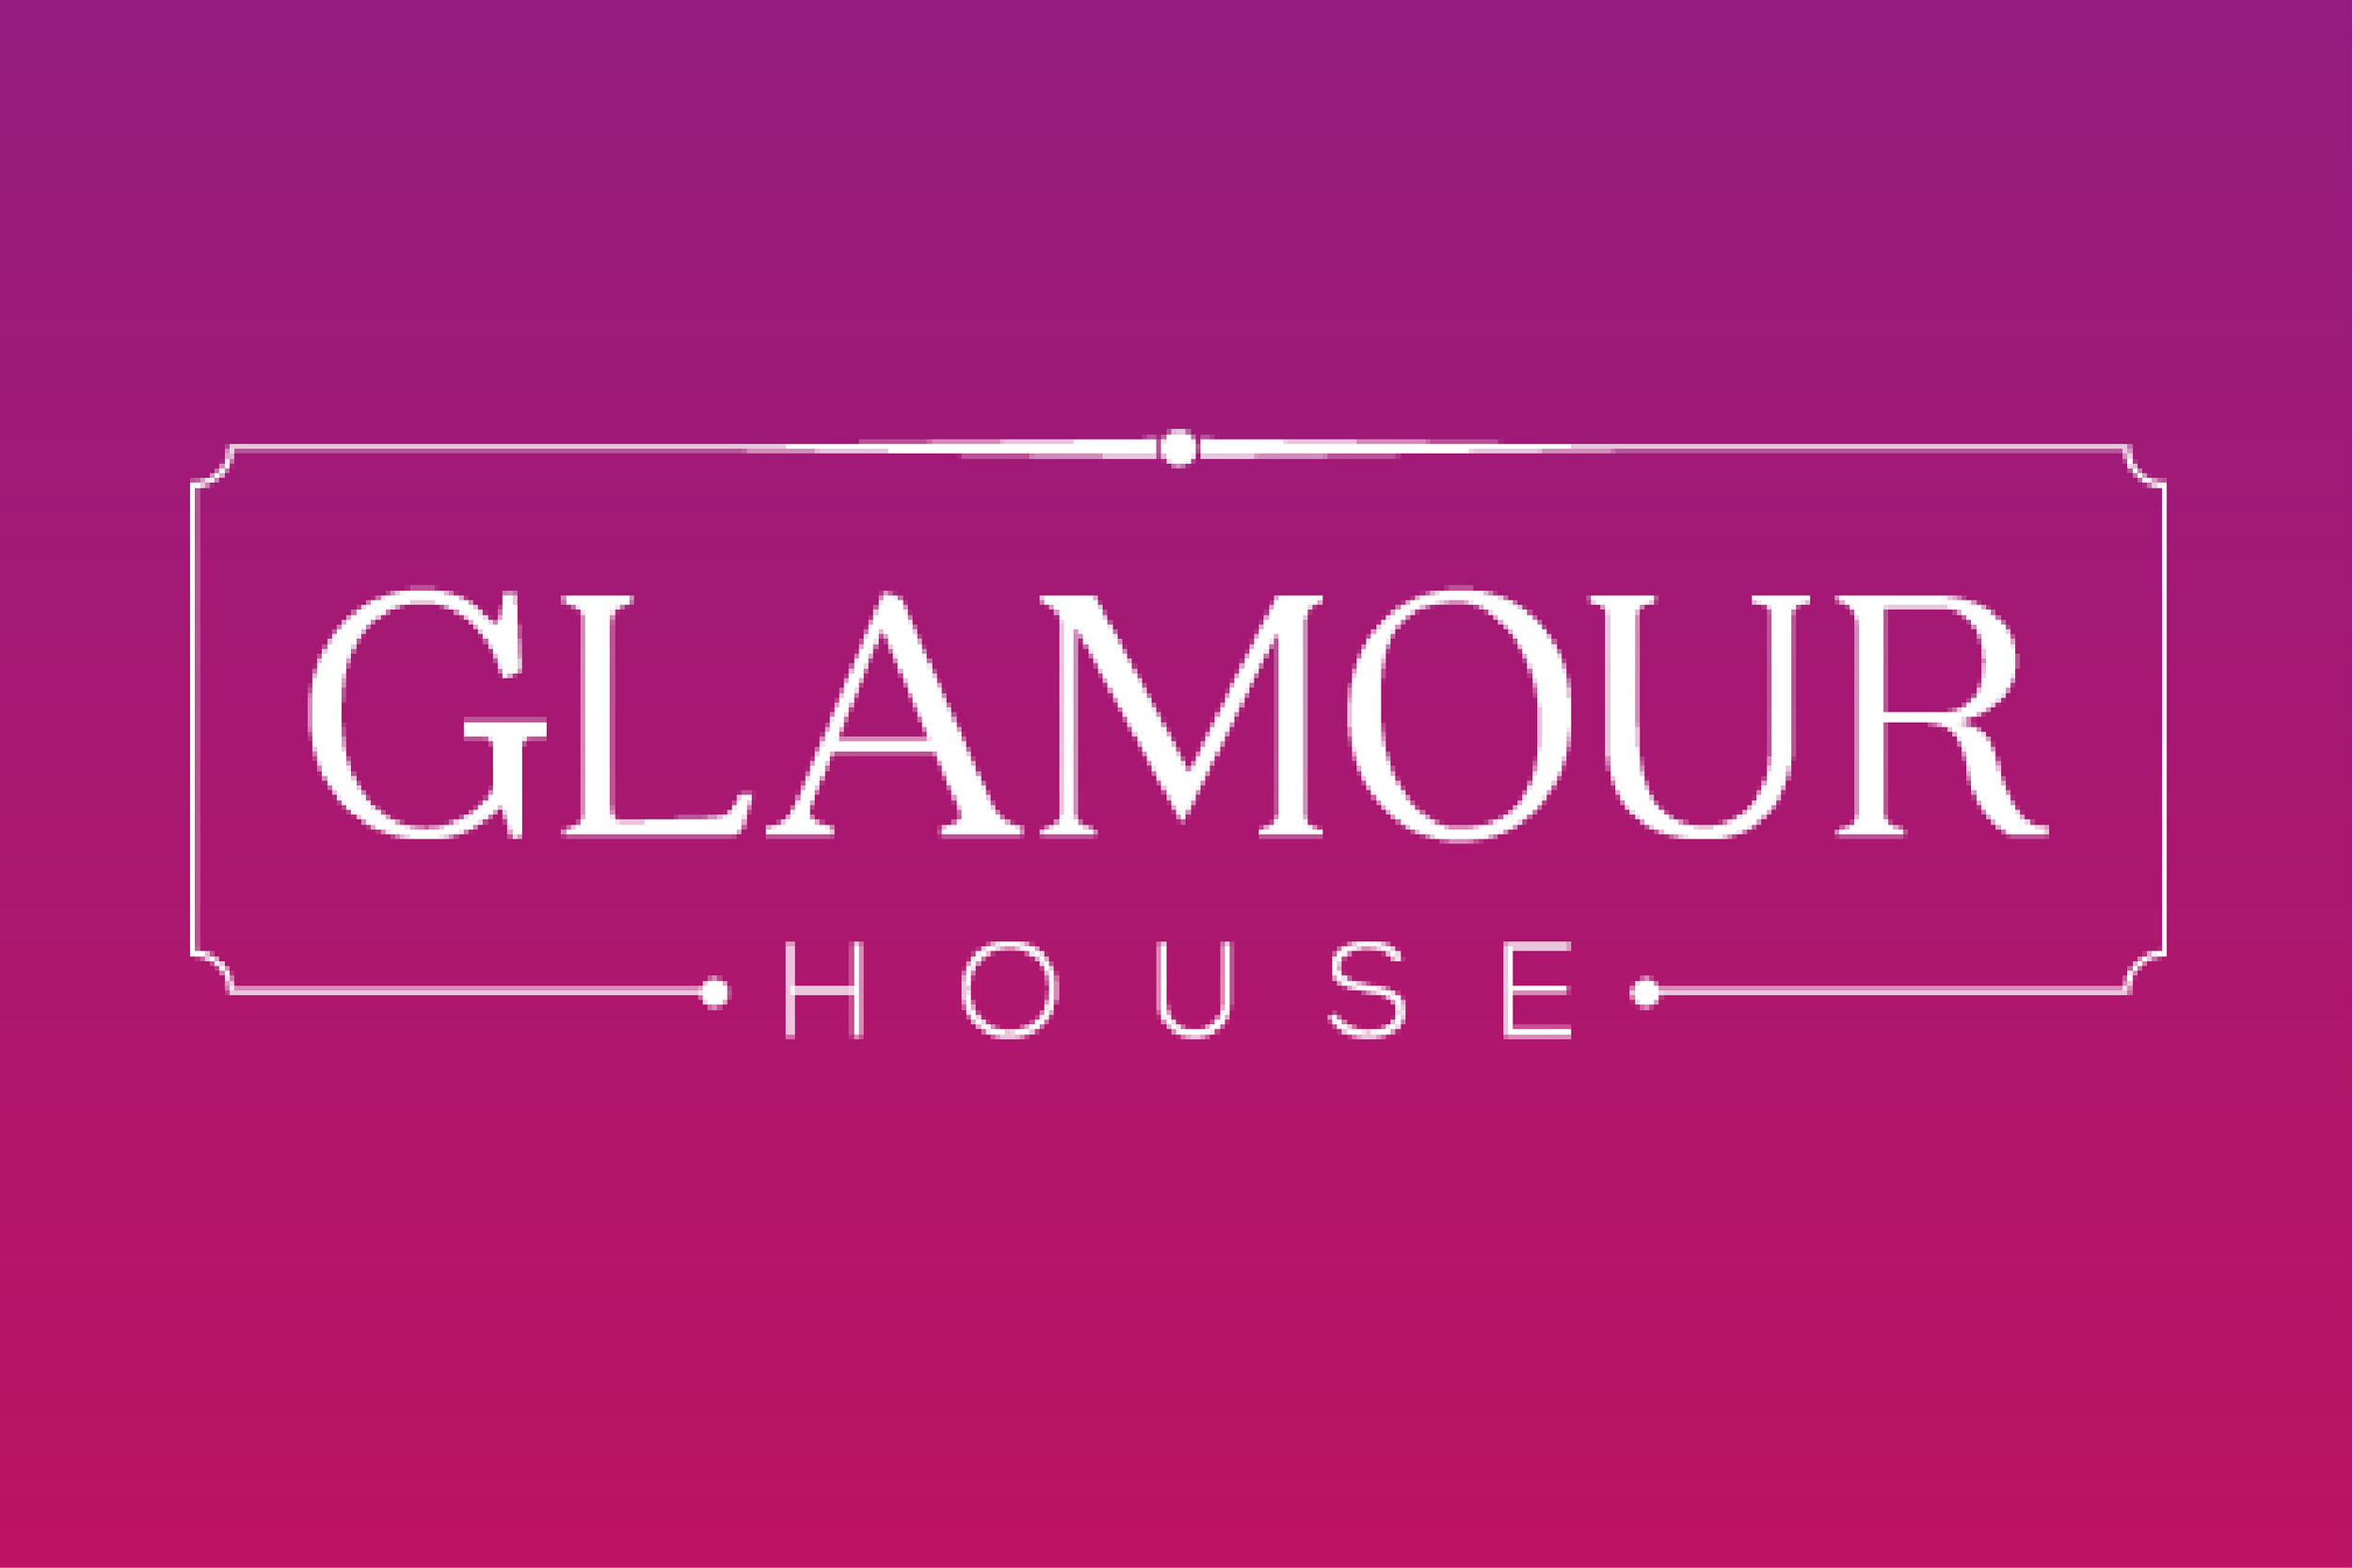 glamour house-01.jpg